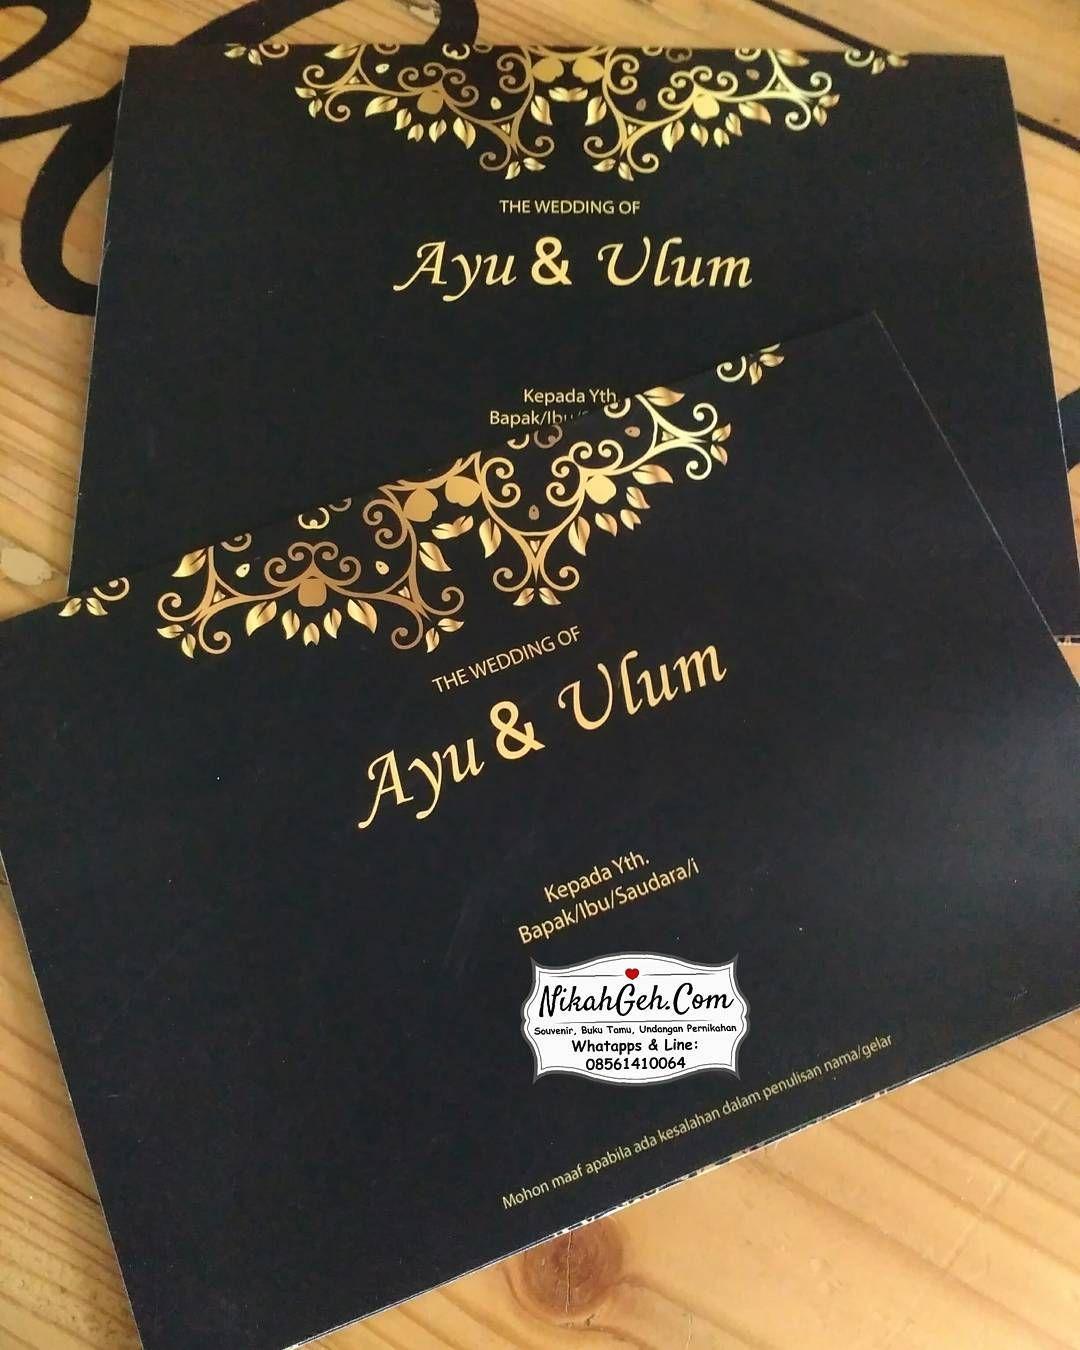 Https Nikahgeh Com Wedding Invitation Ayu Ulum Tanya Tanya Atau Info Lebih Lanju Wedding Card Sample Muslim Wedding Invitations Wedding Invitation Cards